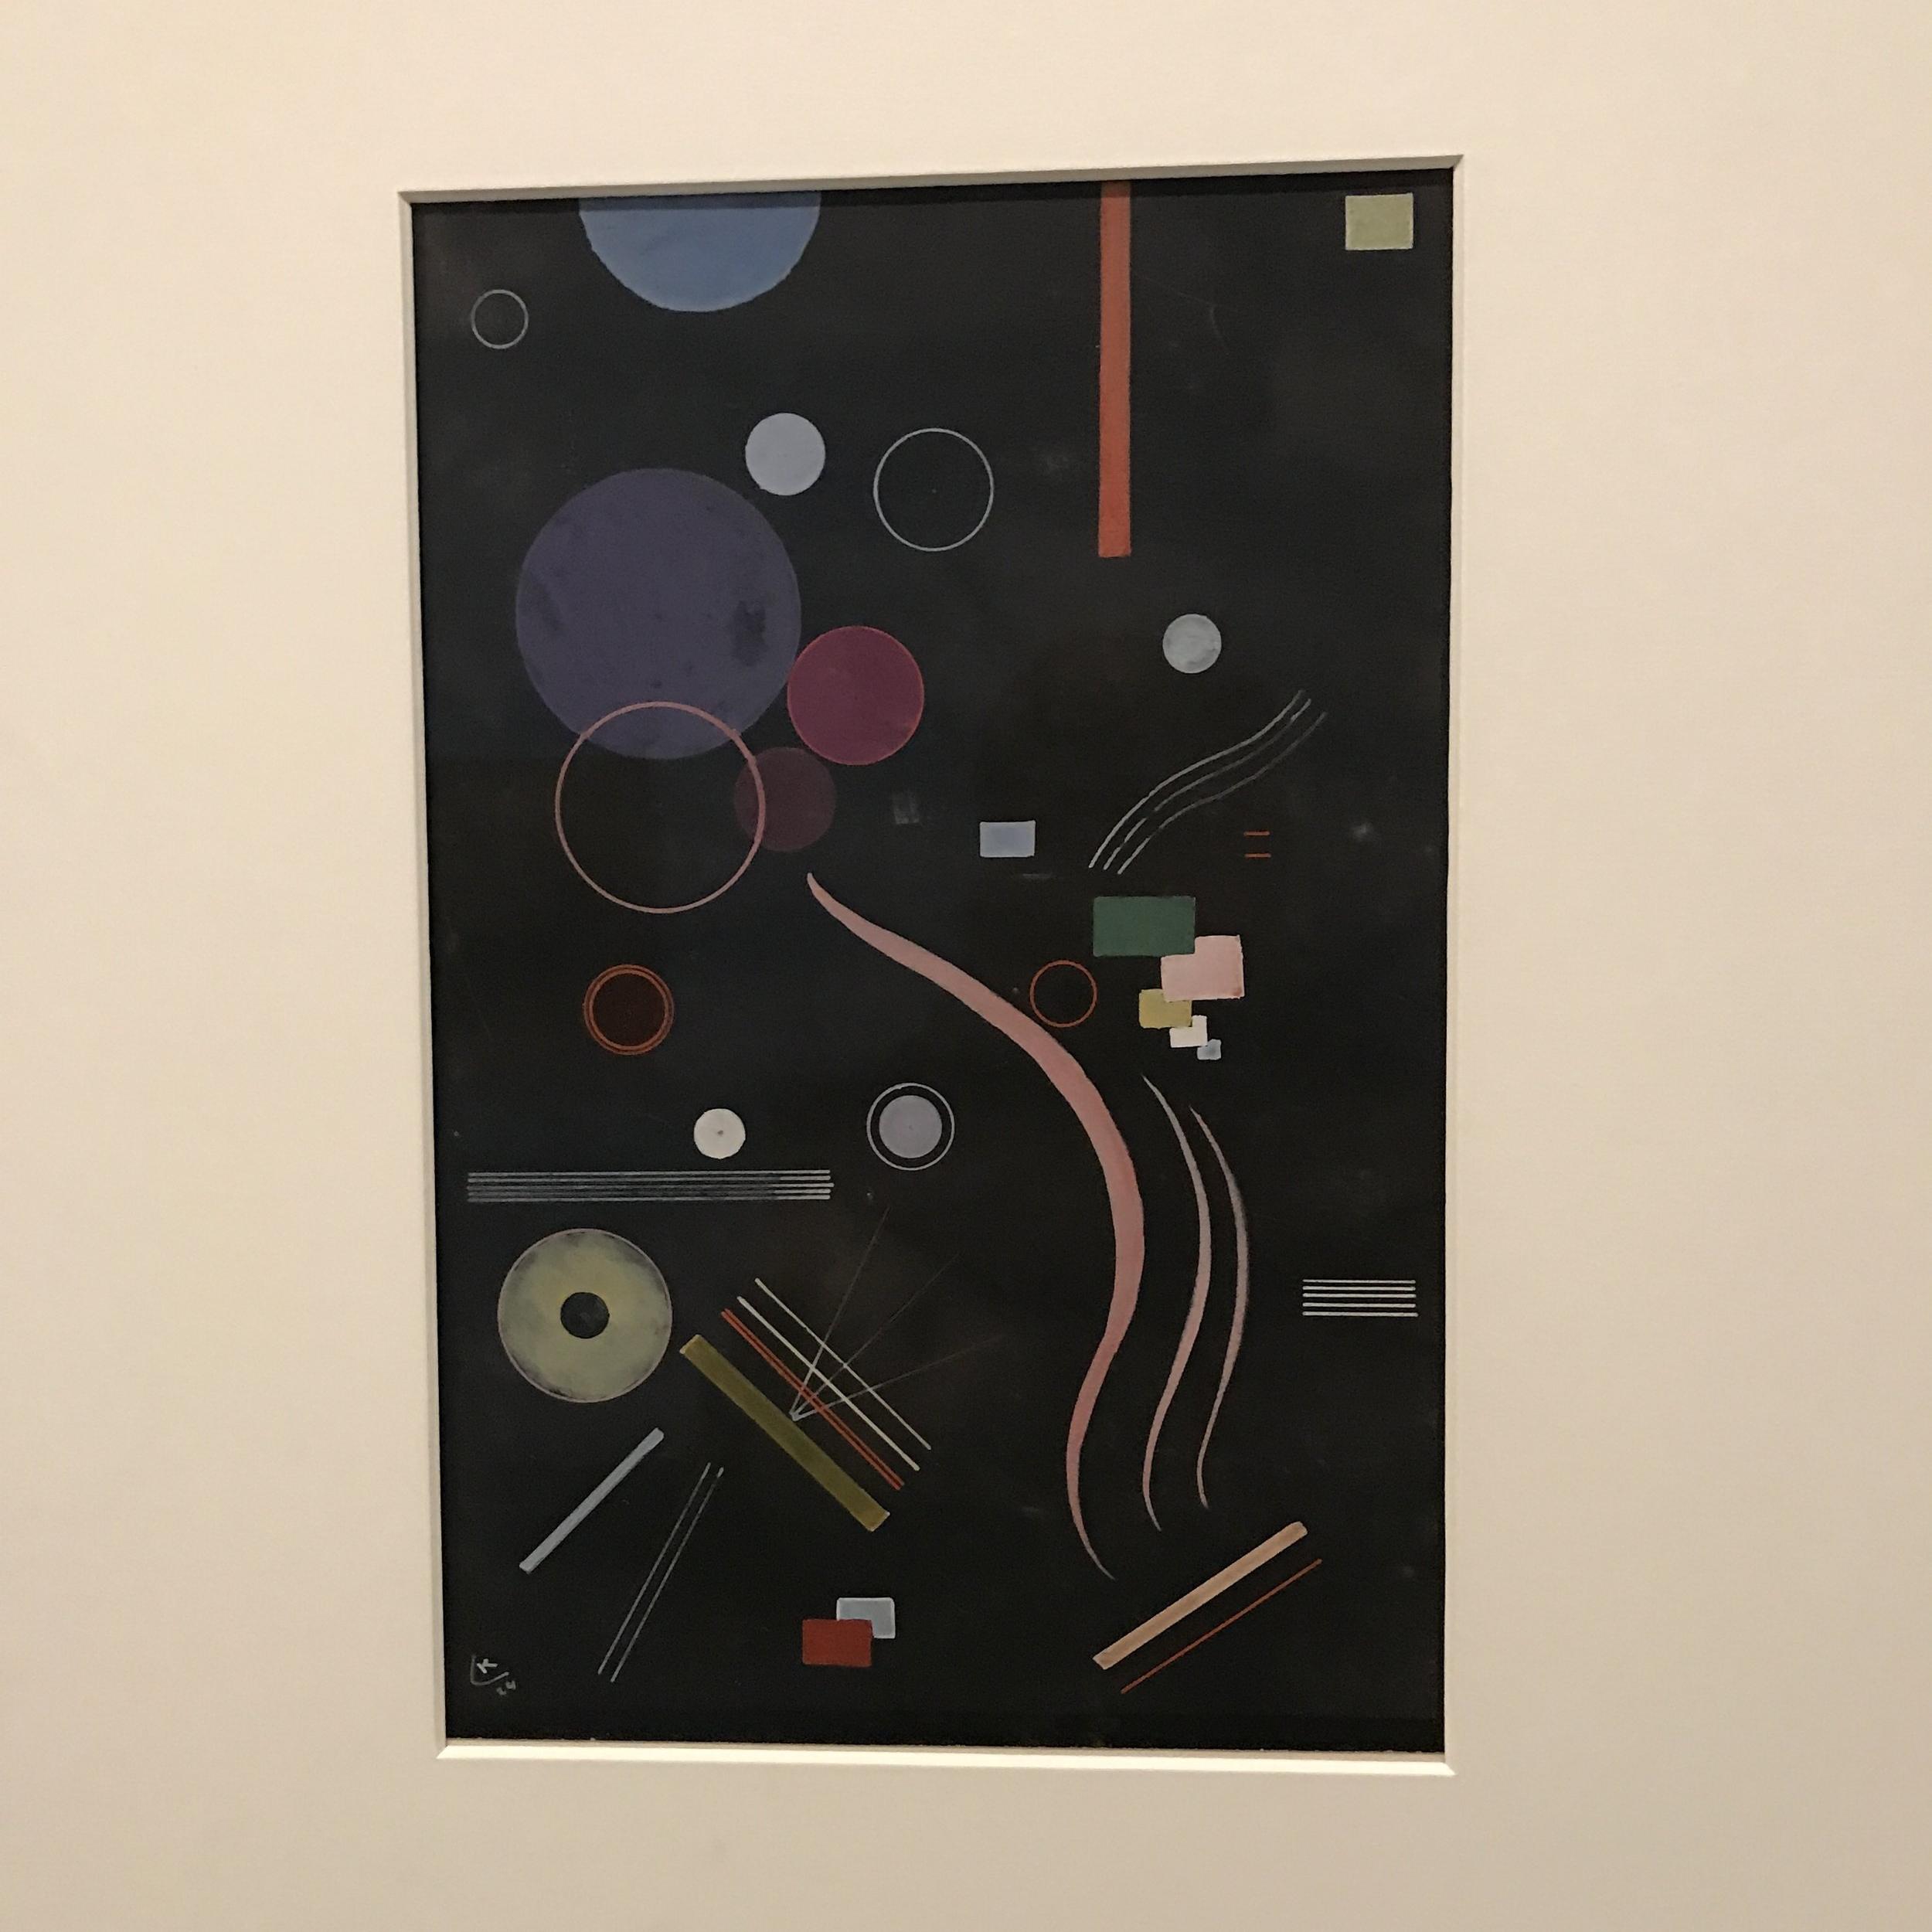 Untitled - Vassily Kandinsky